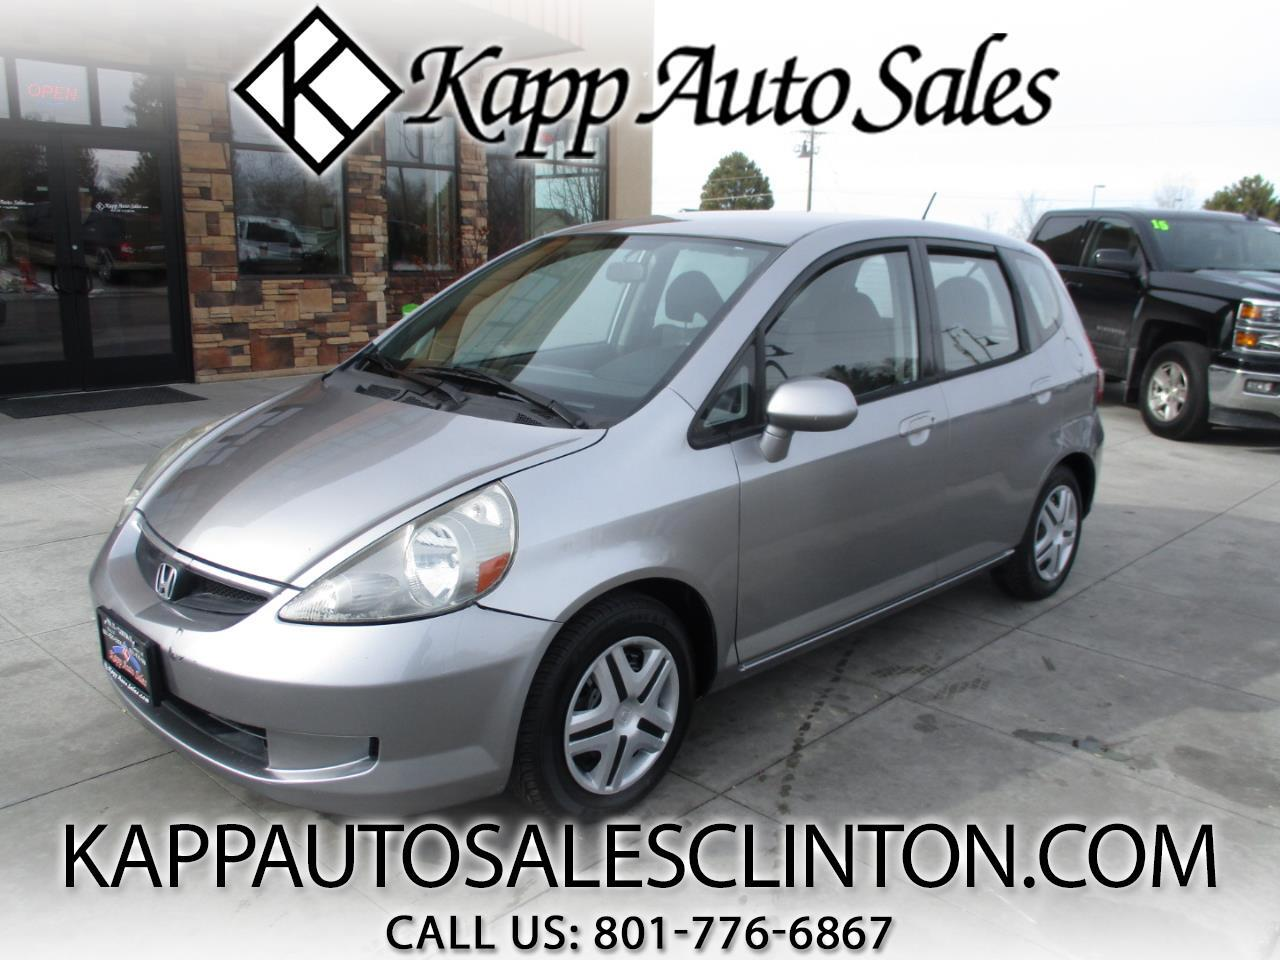 Used Cars For Sale Kapp Auto Sales